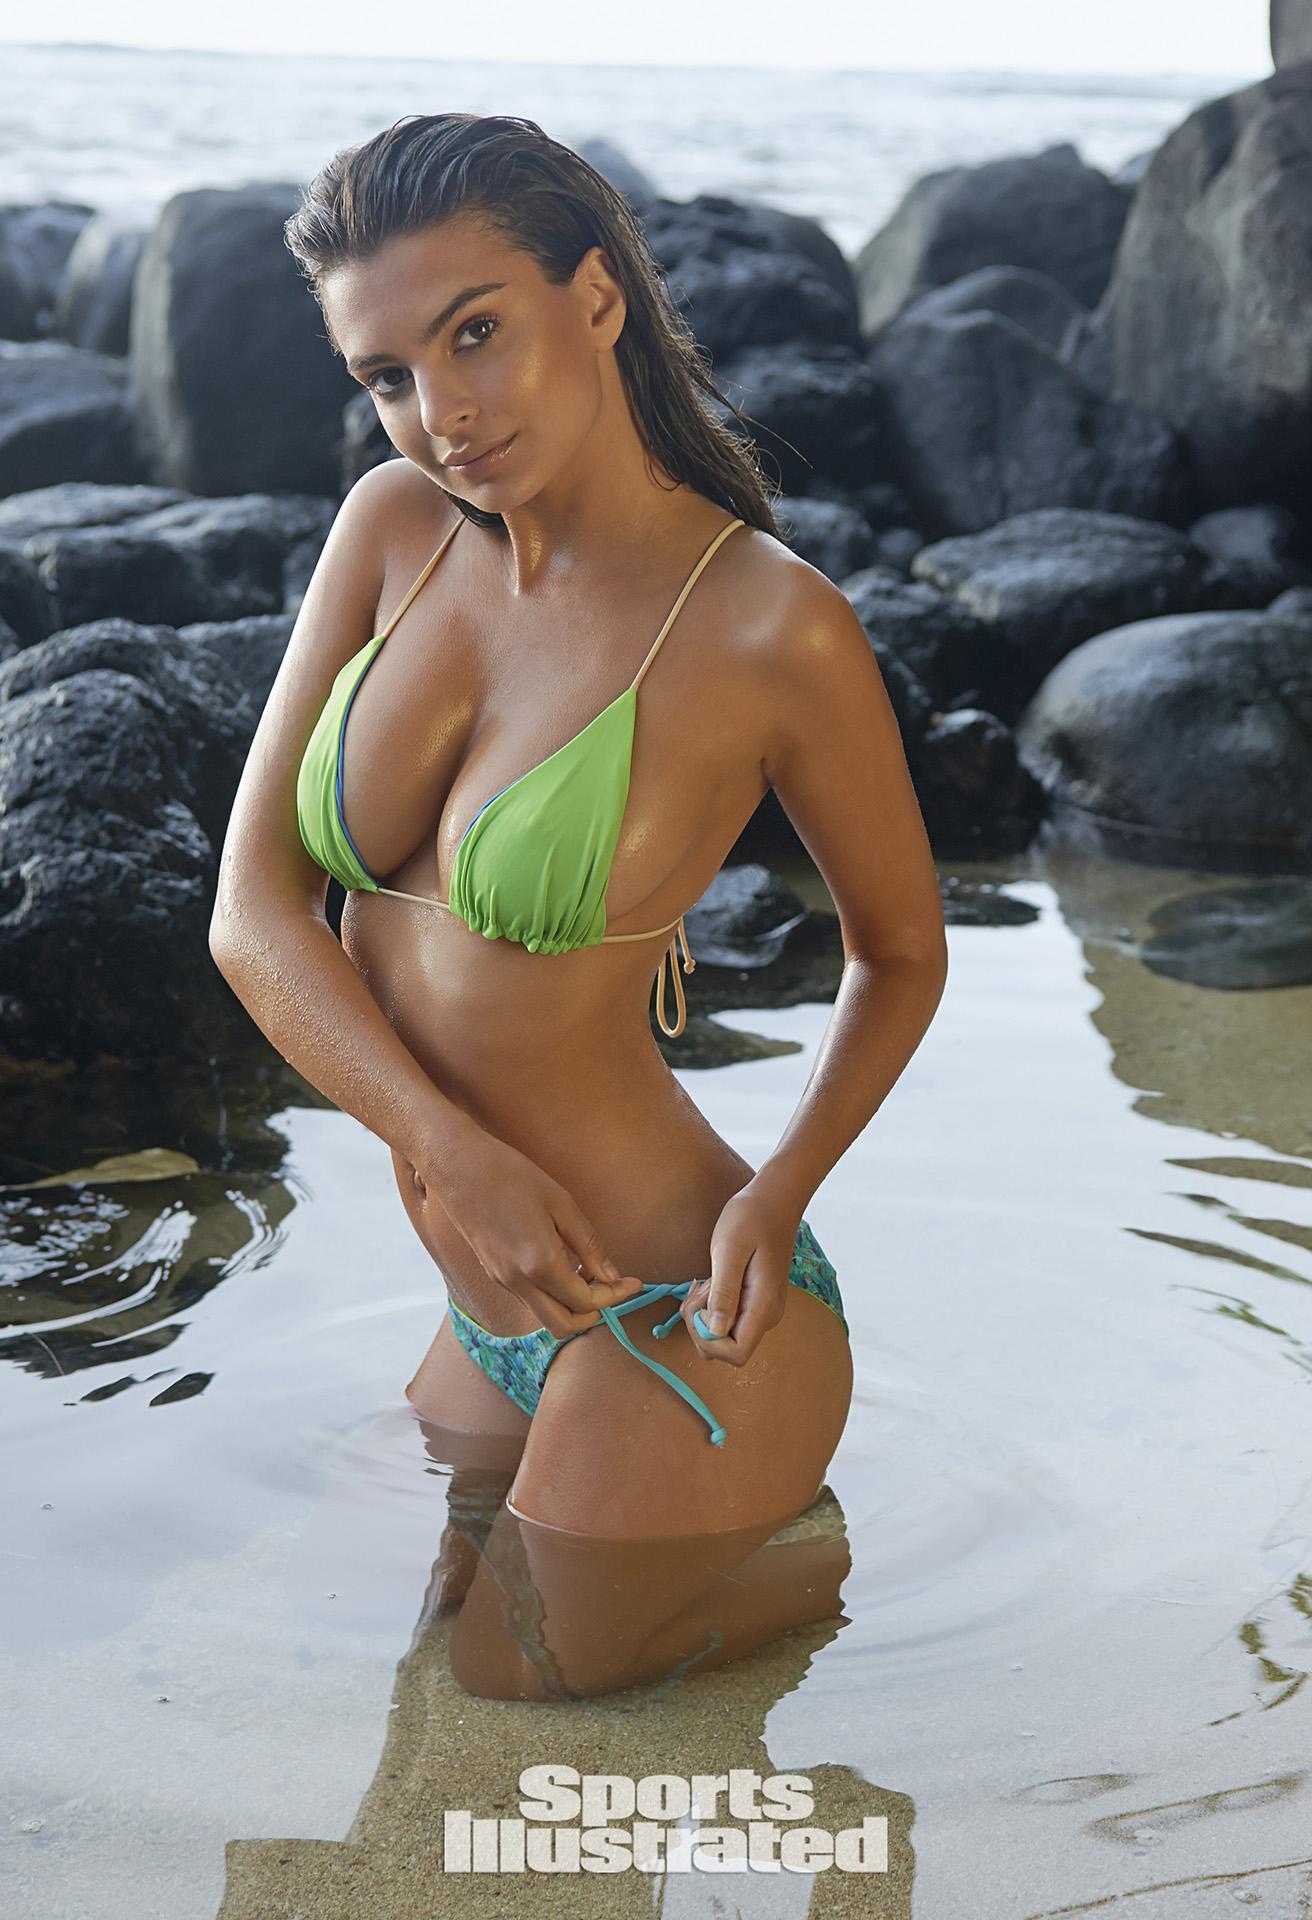 Emily Ratajkowski Swimsuit Photos, Sports Illustrated Swimsuit 2015